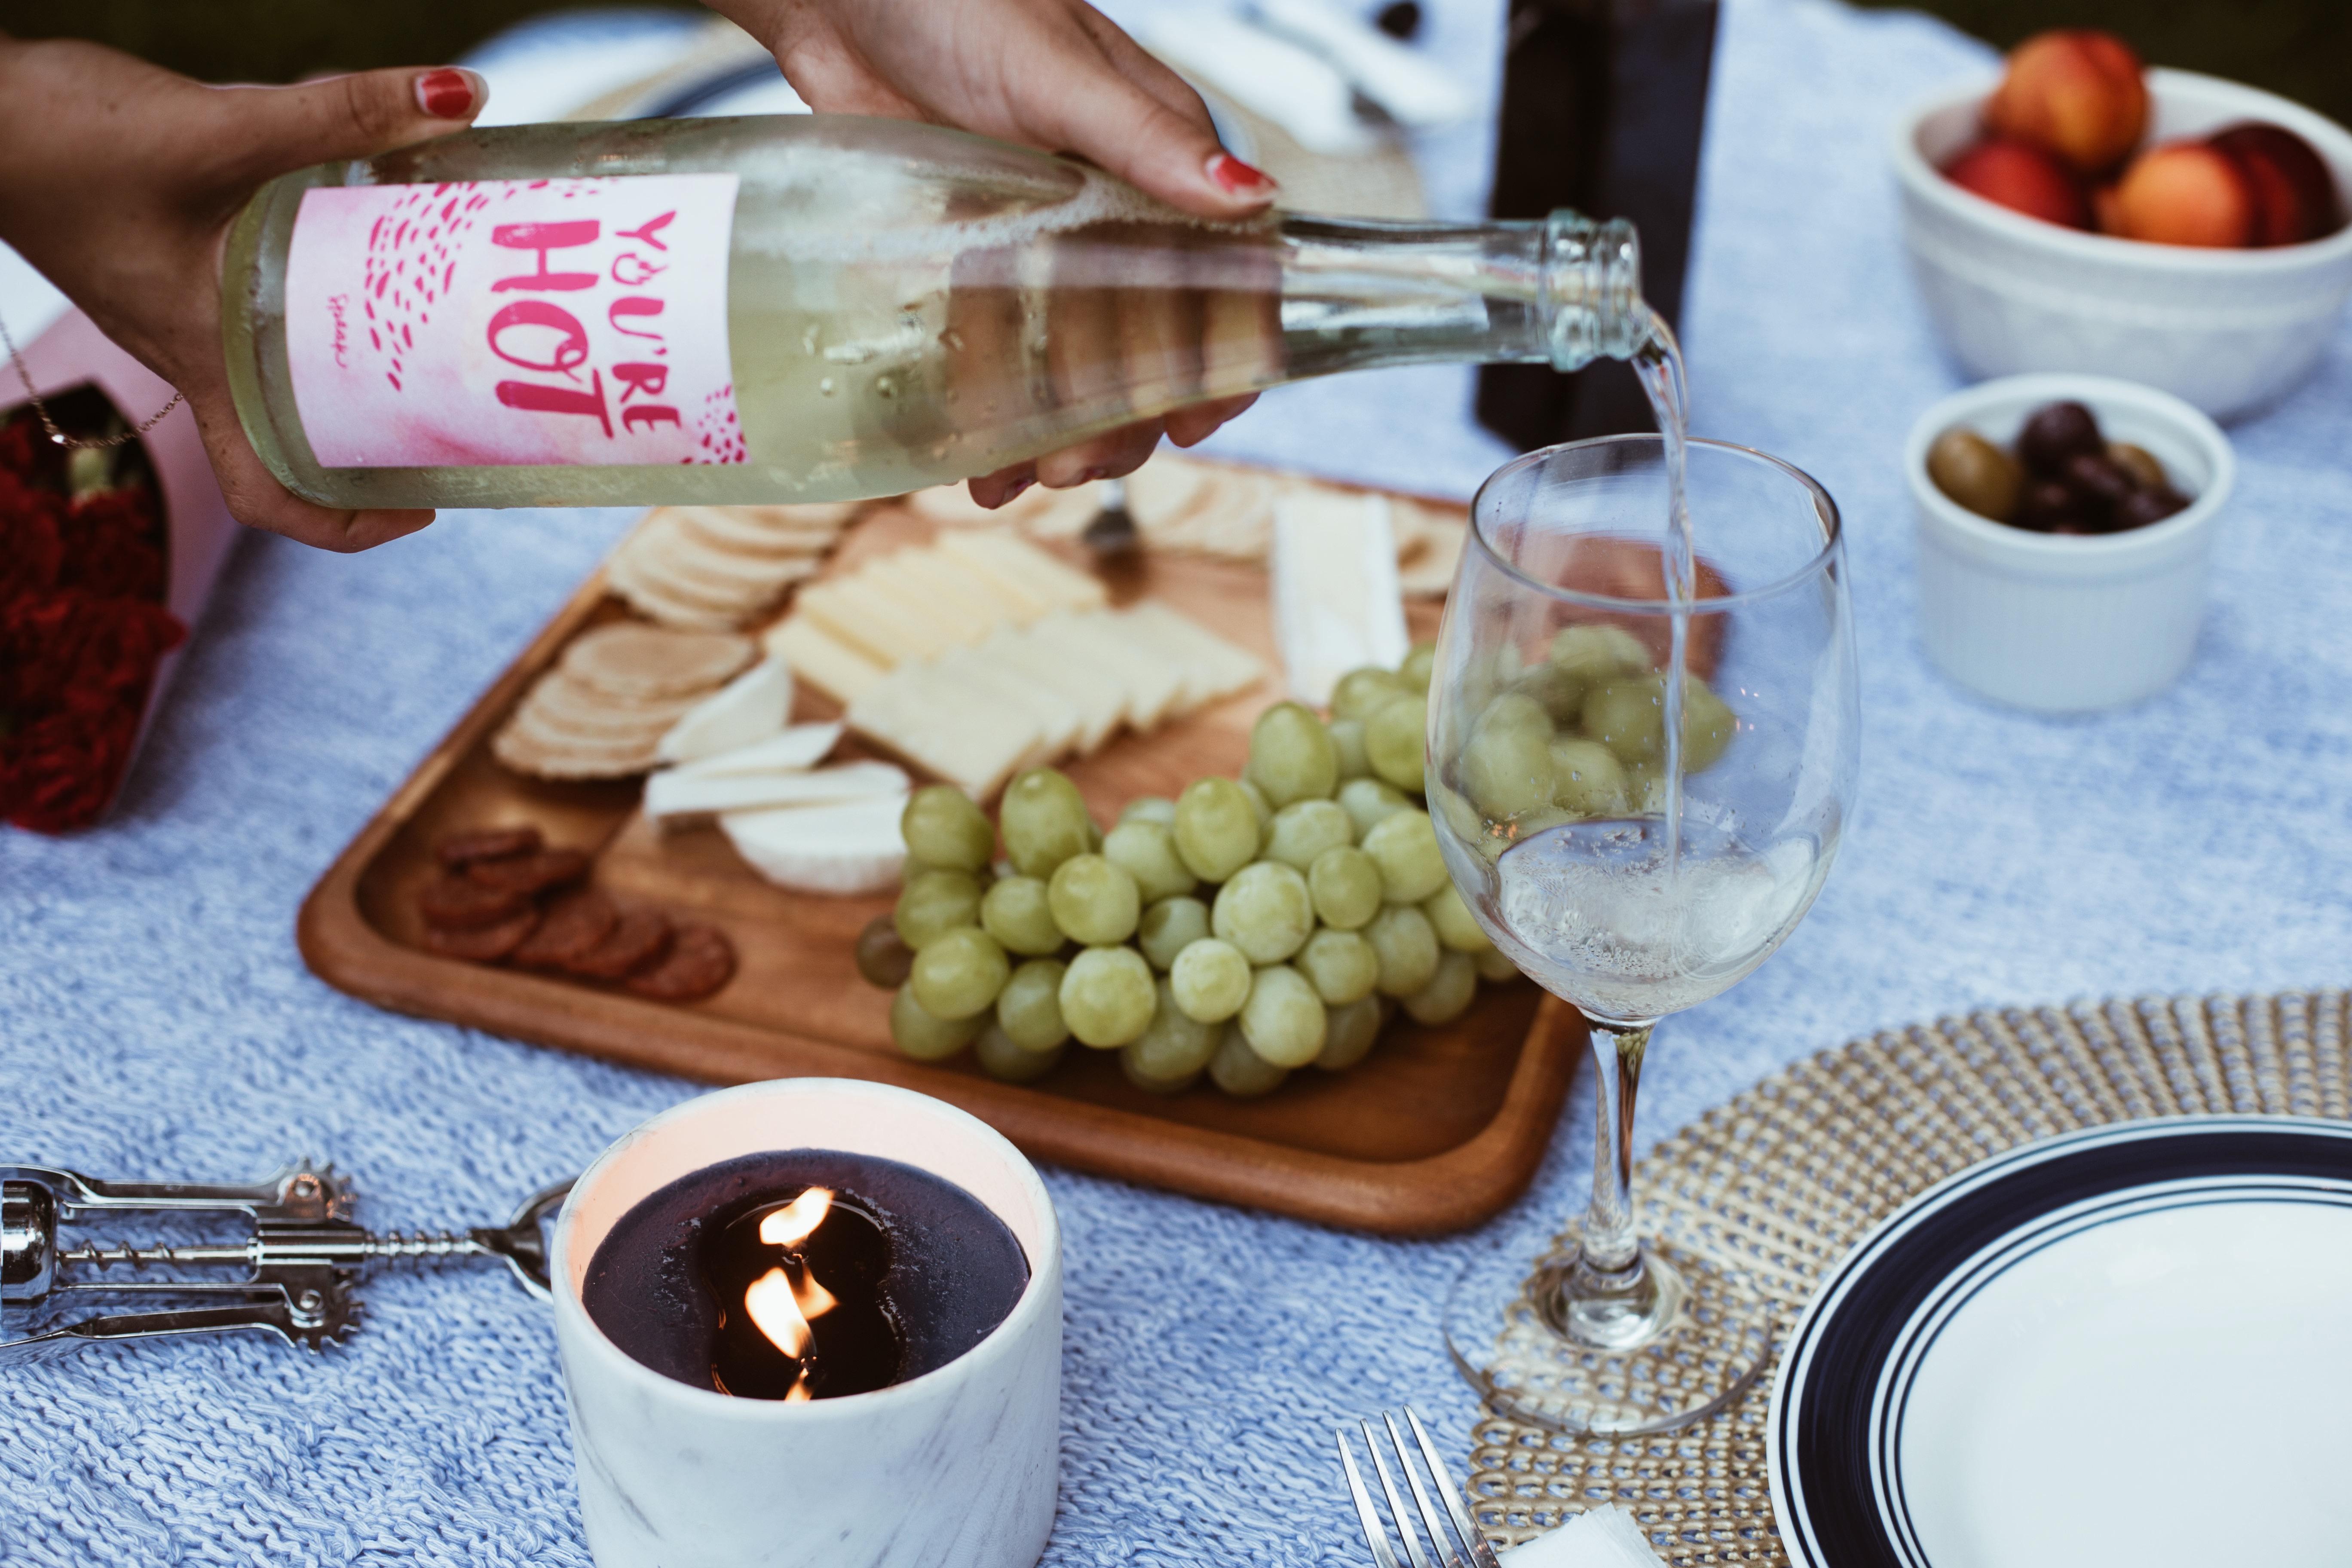 Picnic Essentials w/ Speak Wines   |   Gypsy Life